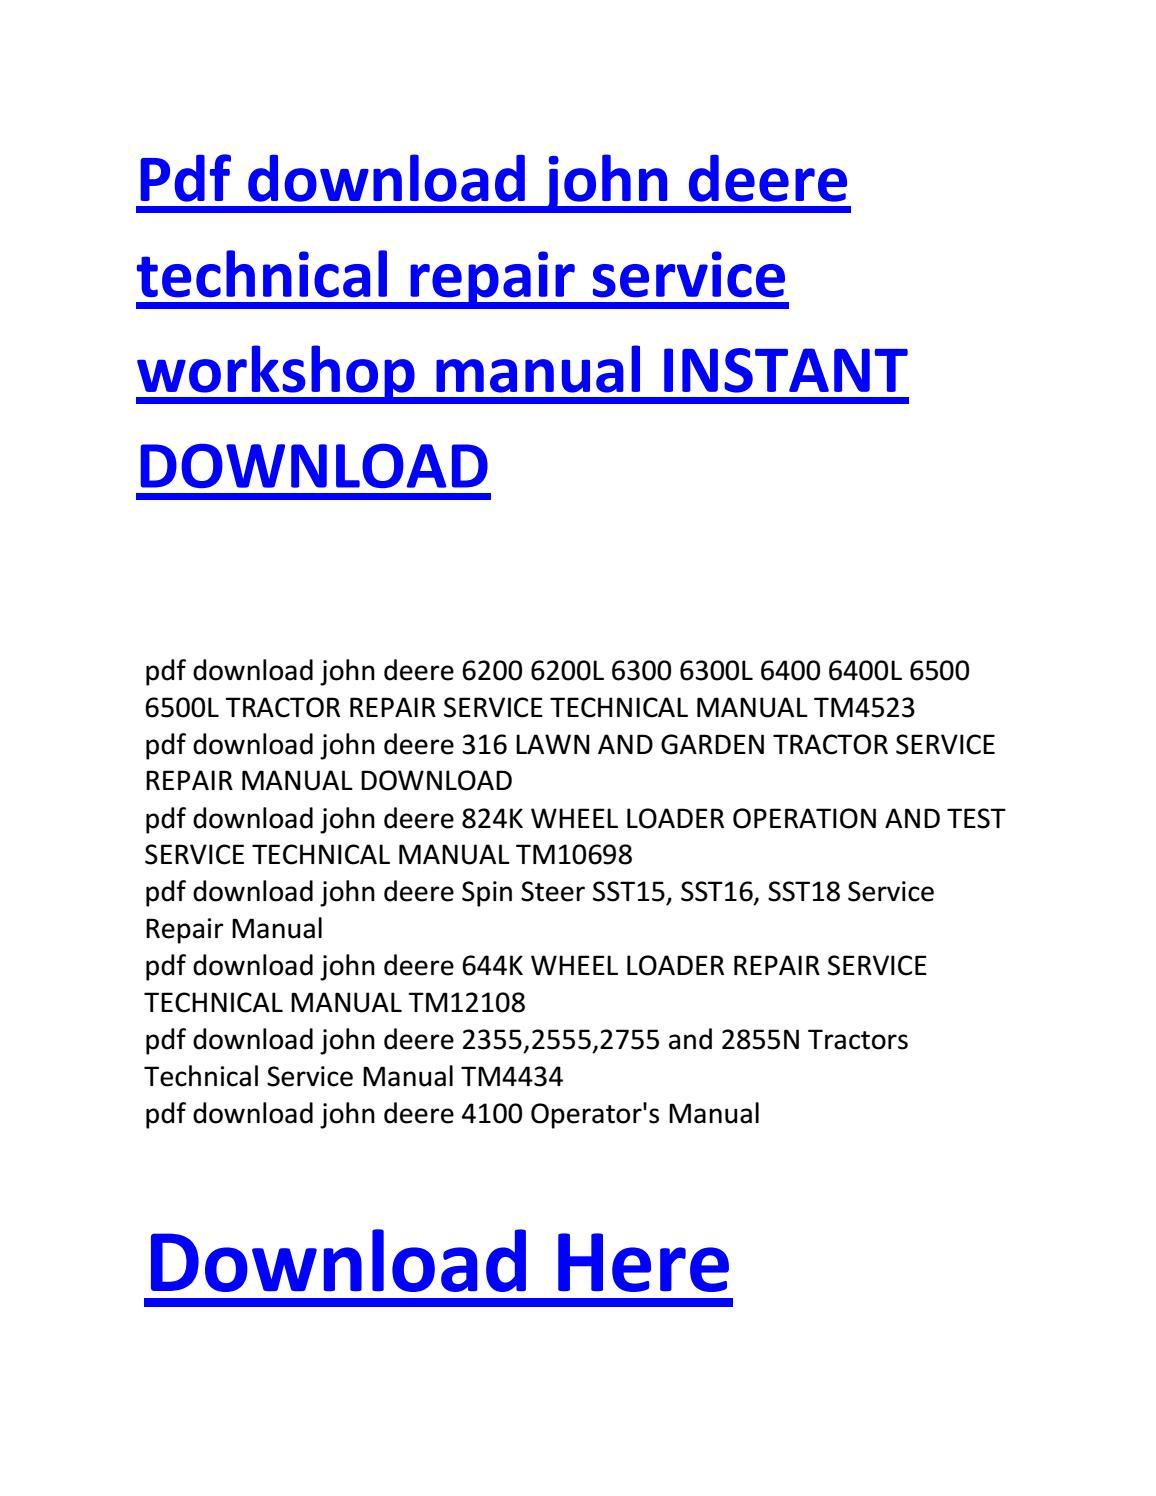 john deere 316 wiring diagram pdf 94 ford explorer speaker electrical toyskids co download technical repair service workshop pto